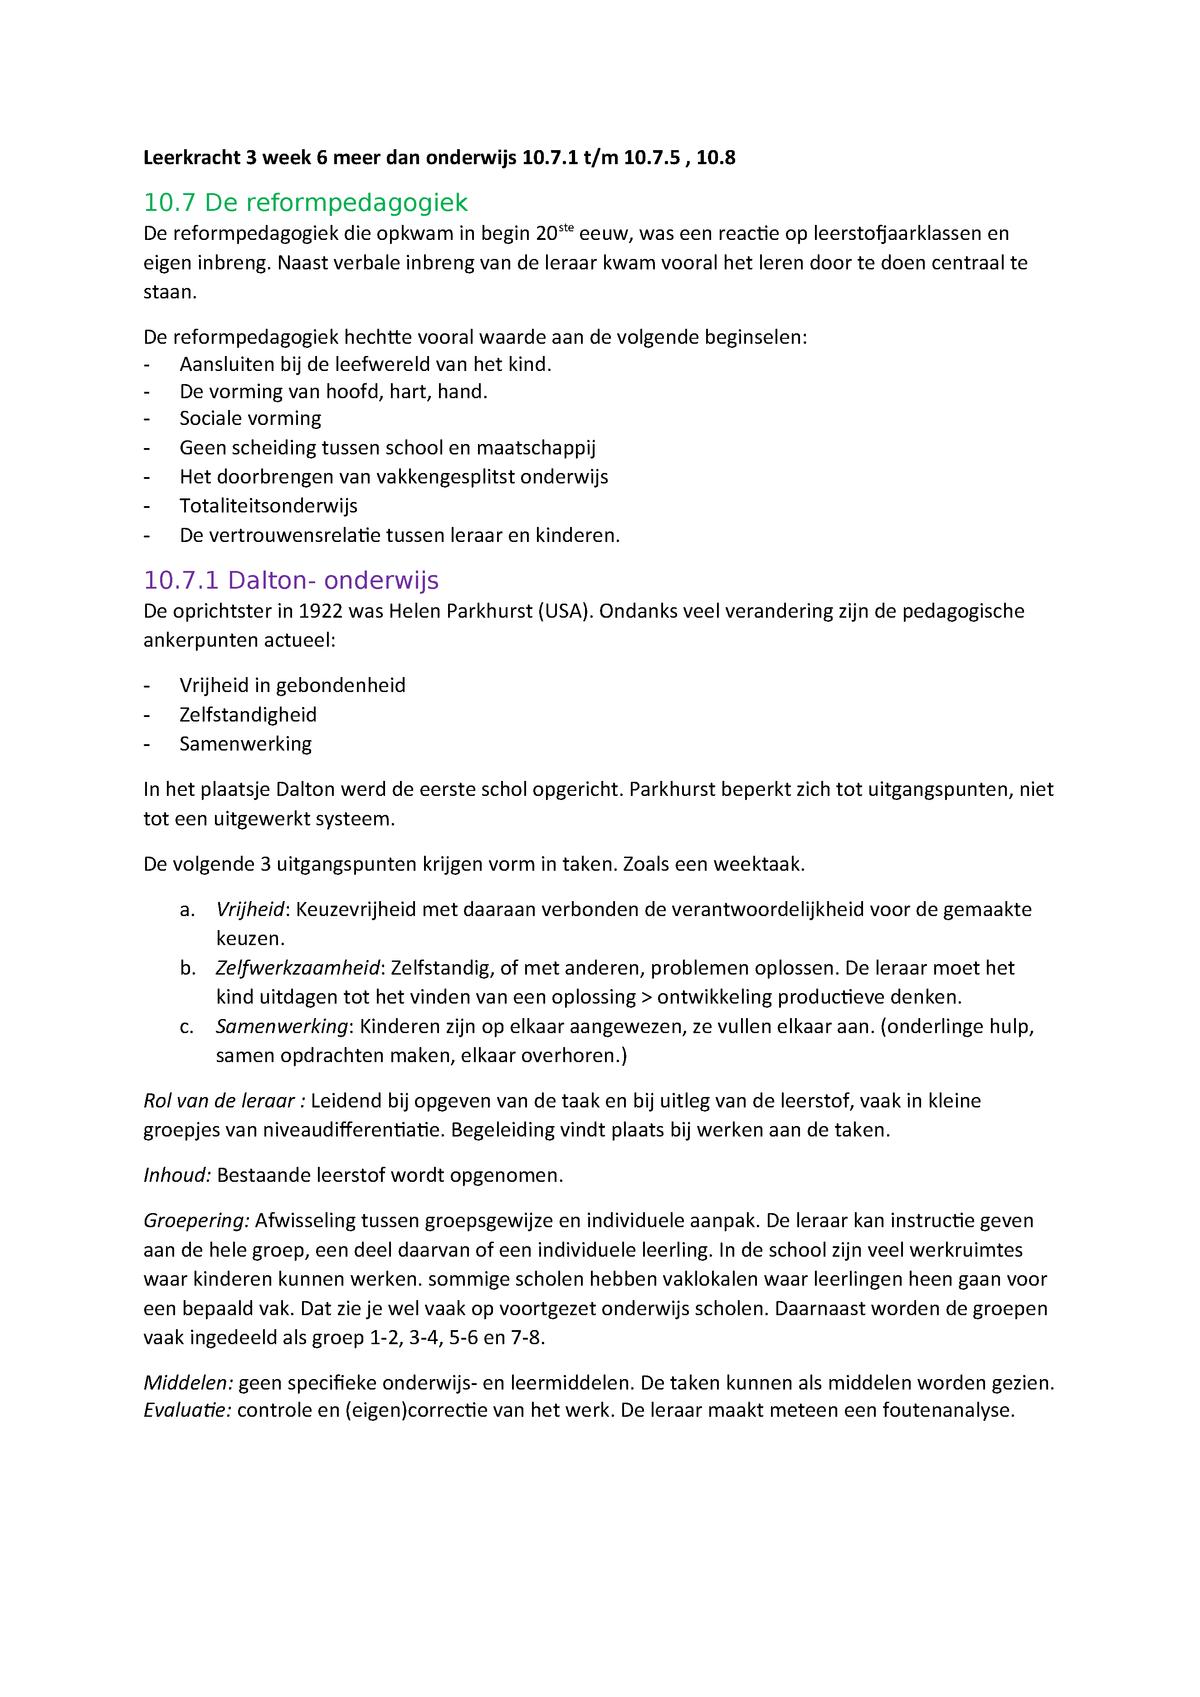 3ed5f7412a0 Samenvatting Méér dan Onderwijs 18 Jan 2017 - StudeerSnel.nl